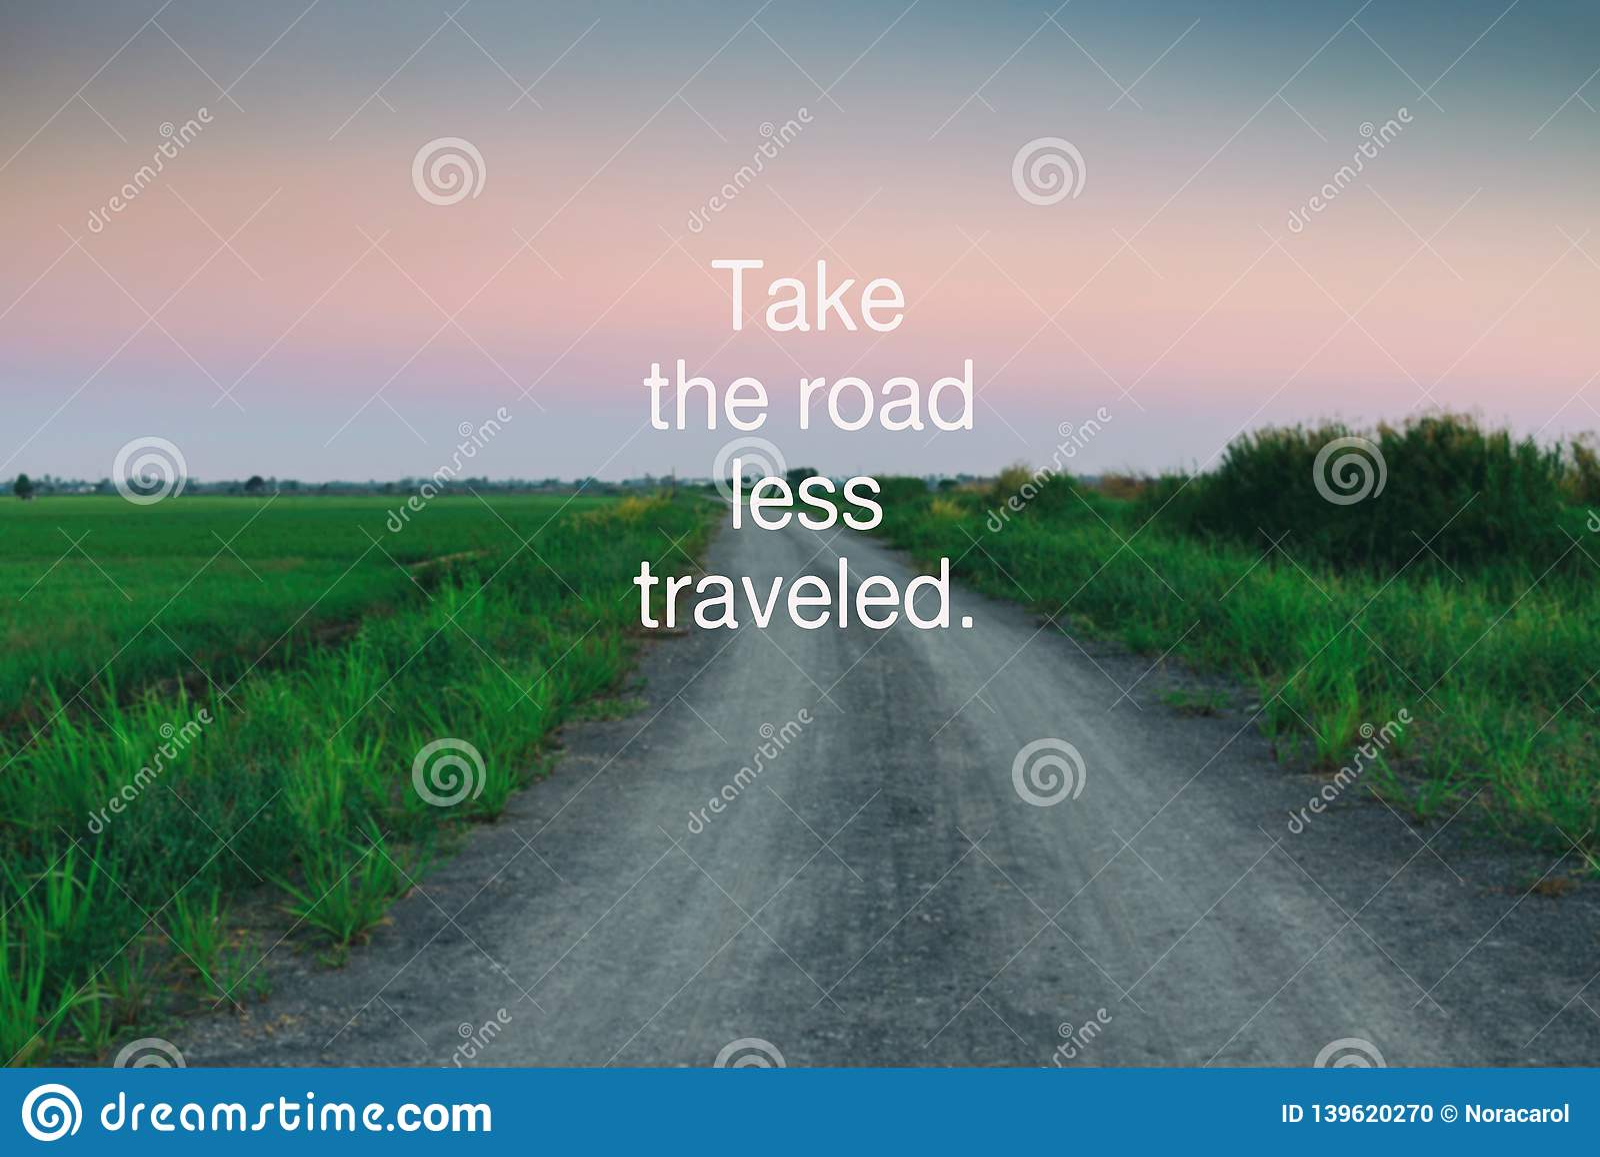 take the road less traveled stock illustration illustration of